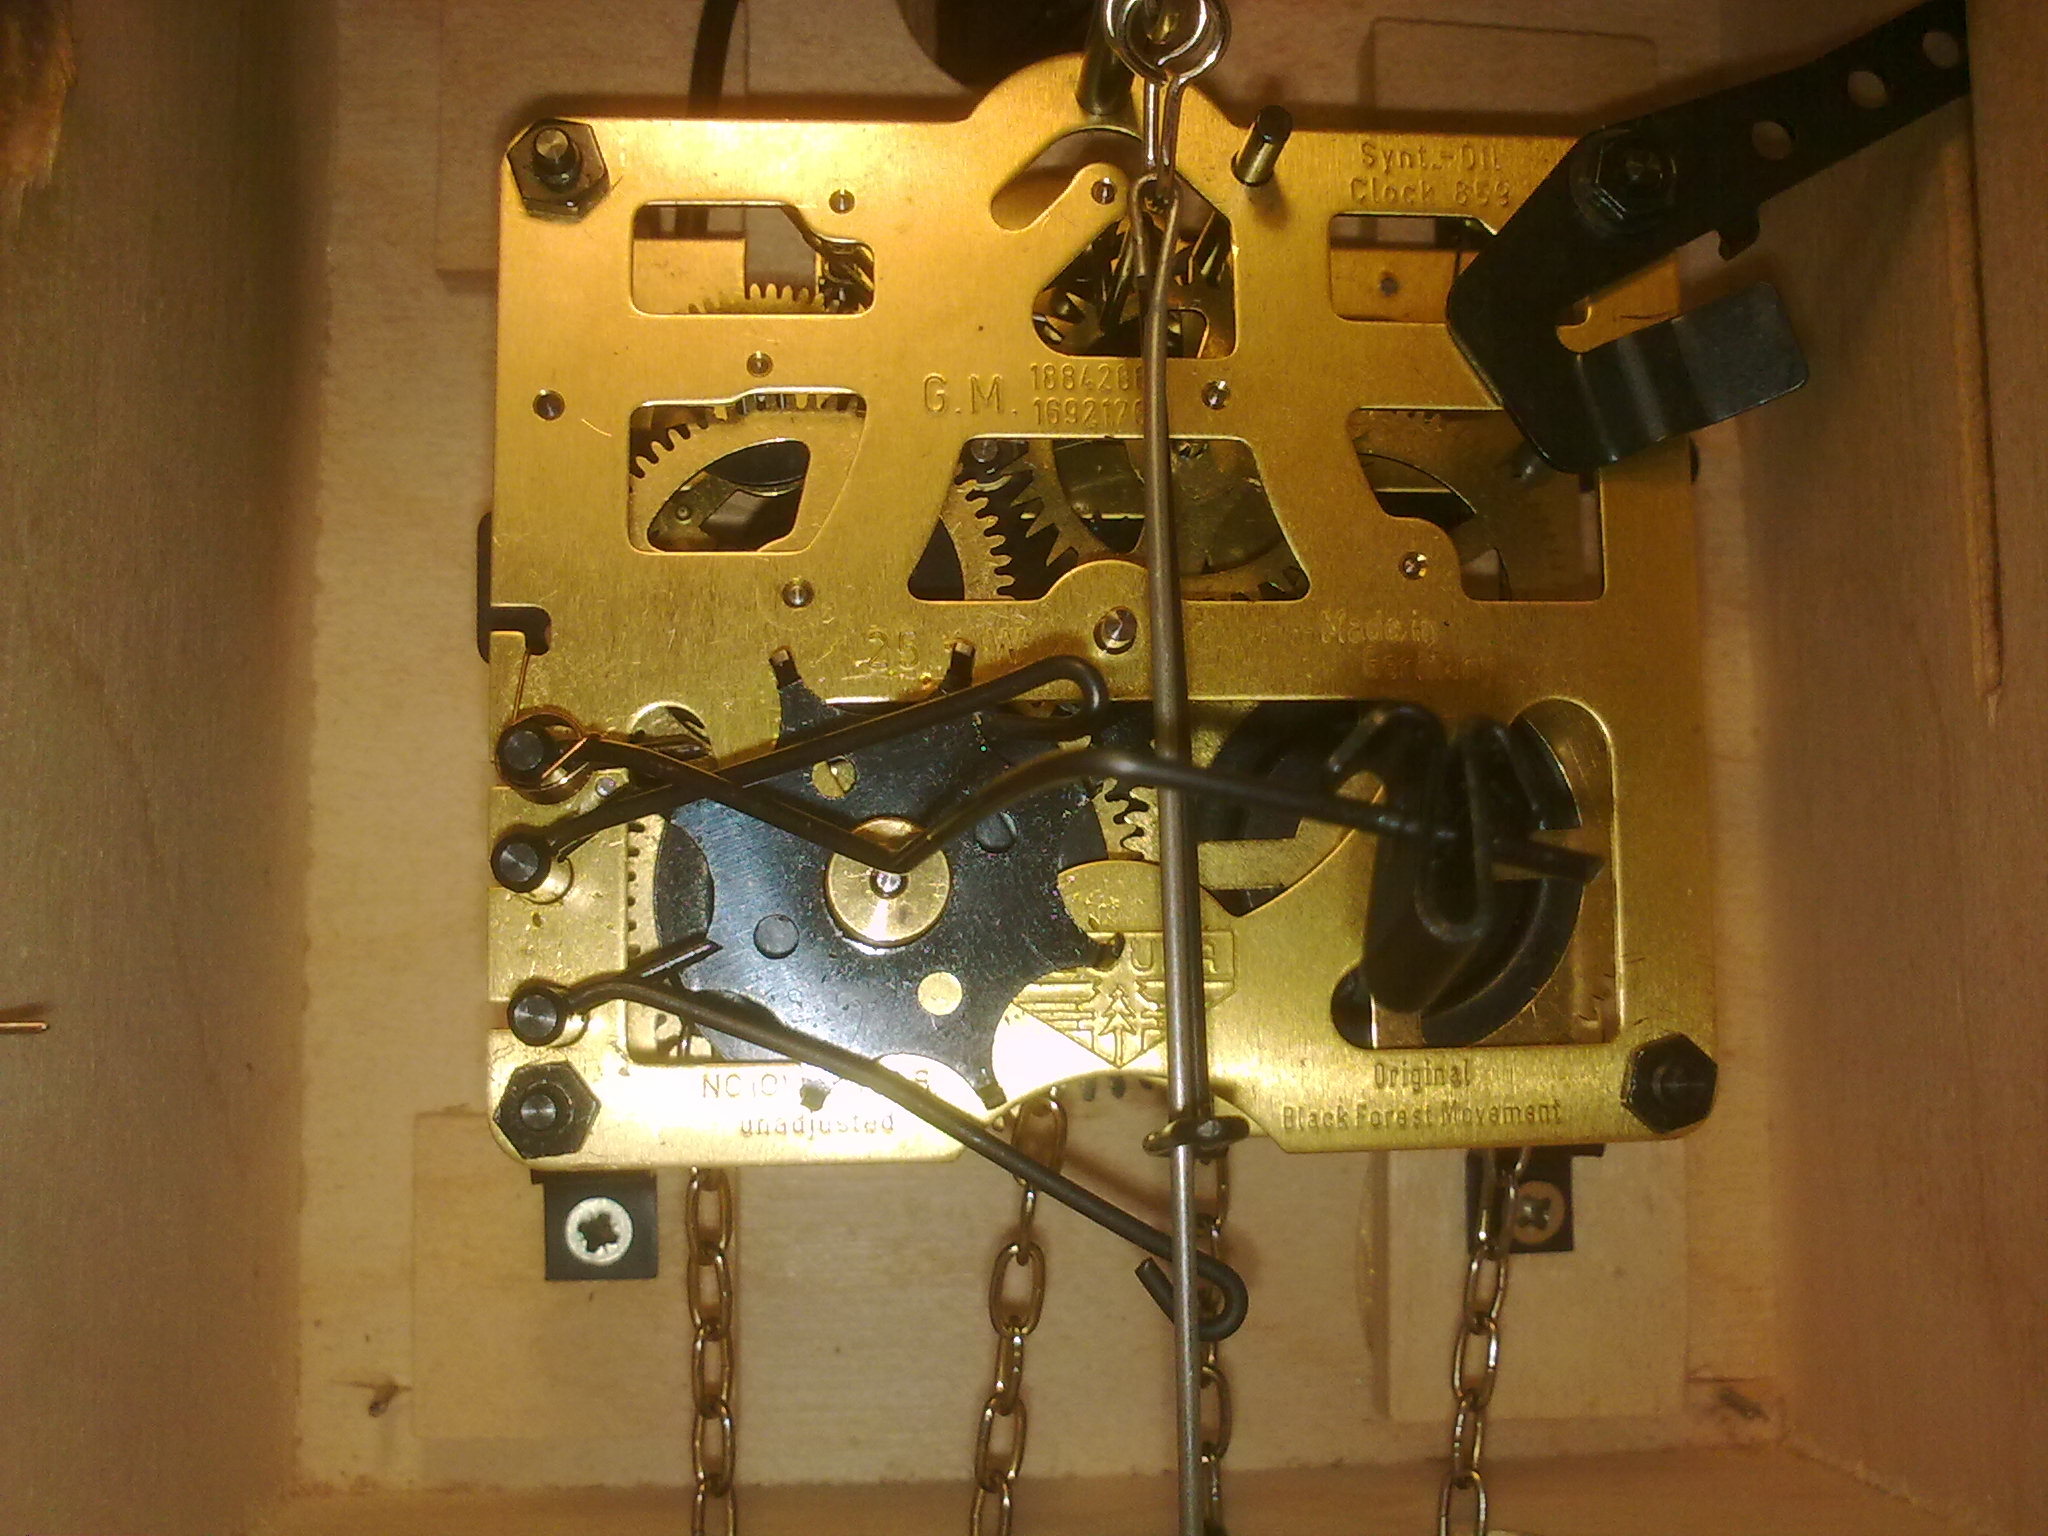 meccanismo interno orologio a cucu